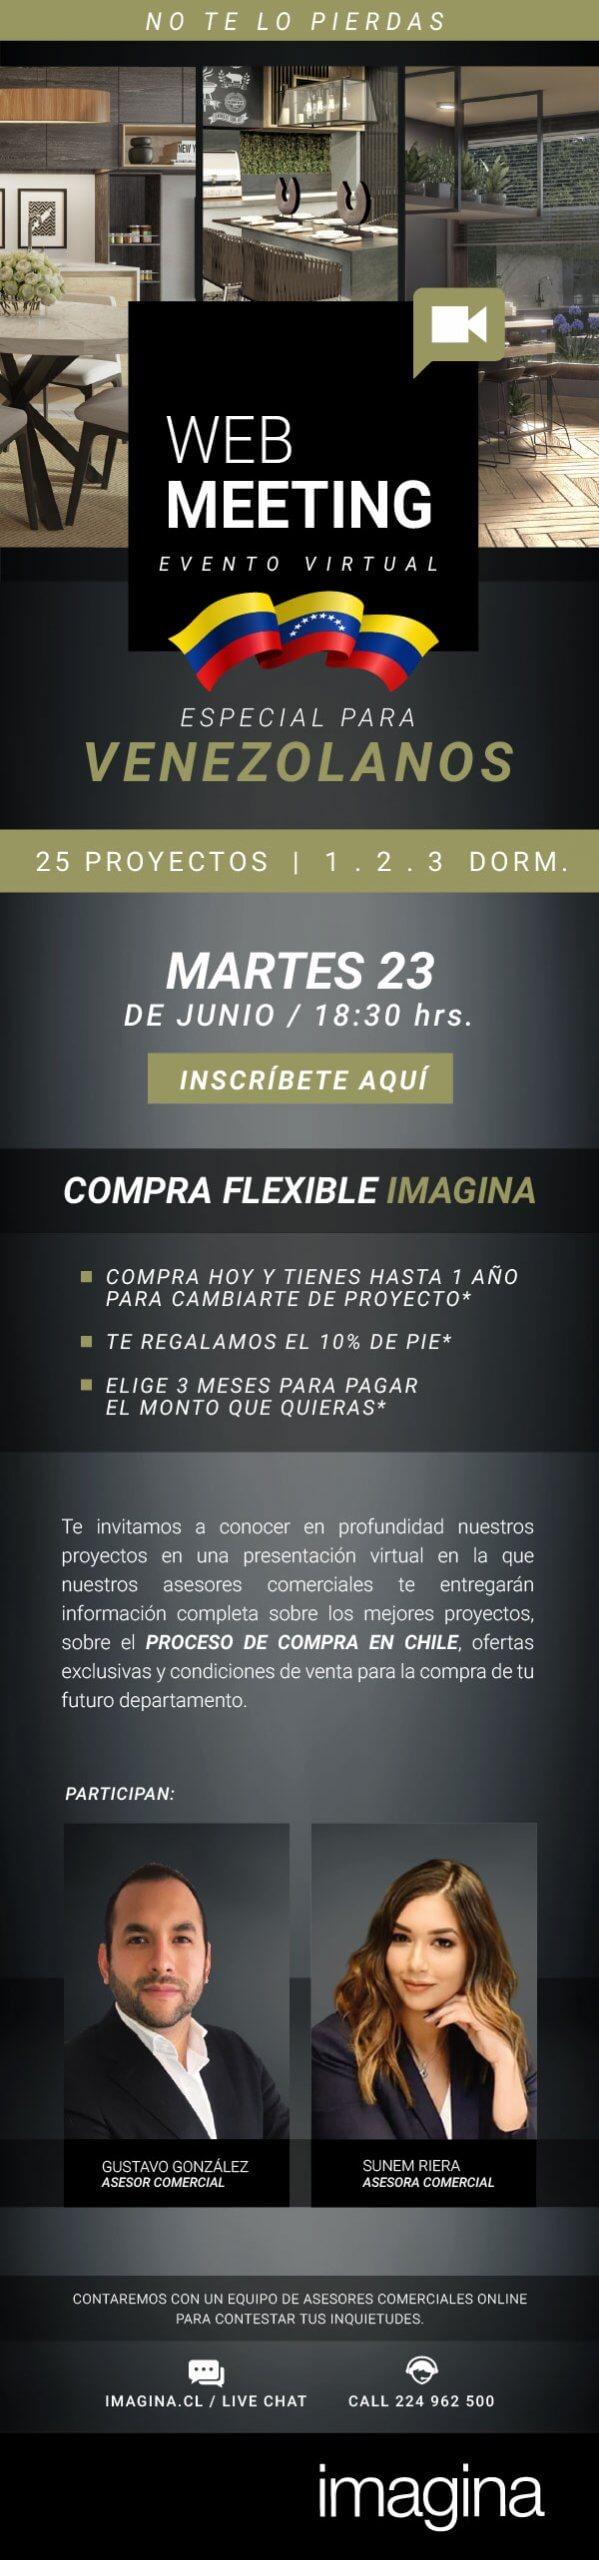 Web meeting Inmobiliaria Imagina para venezolanos